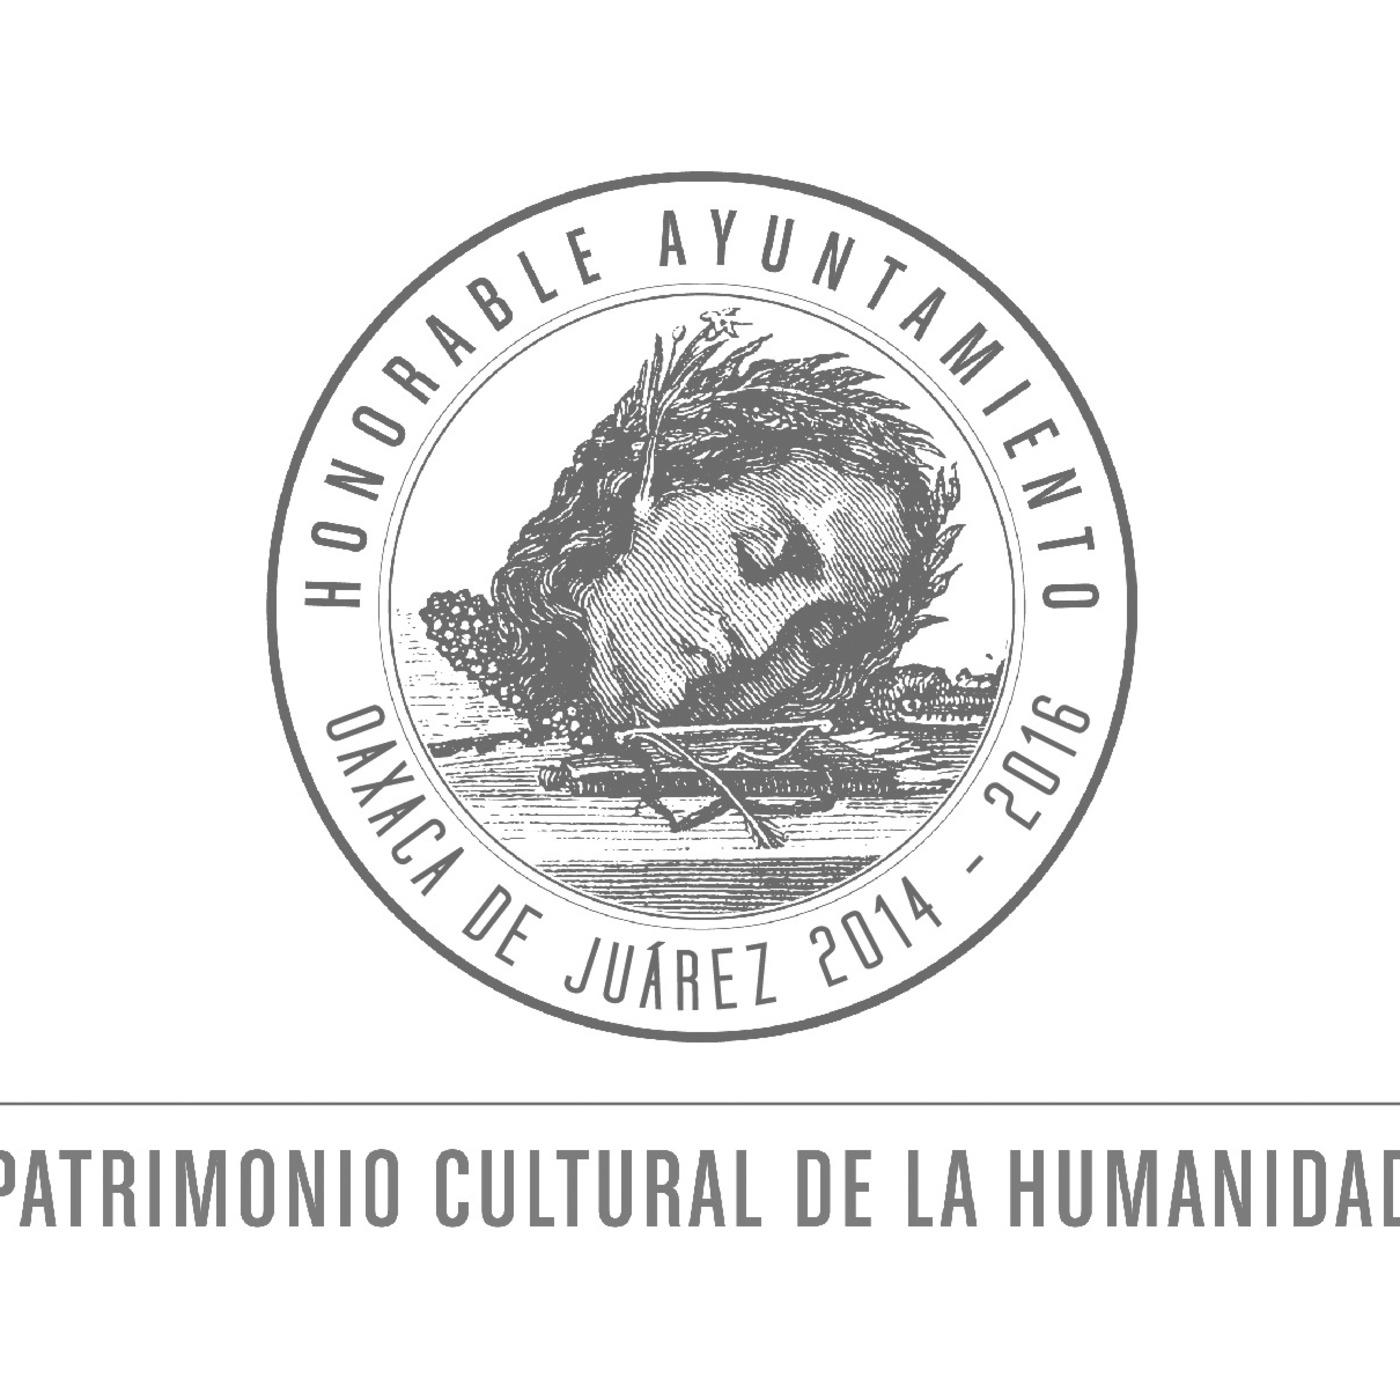 Municipio de Oaxaca de Juárez's Podcast